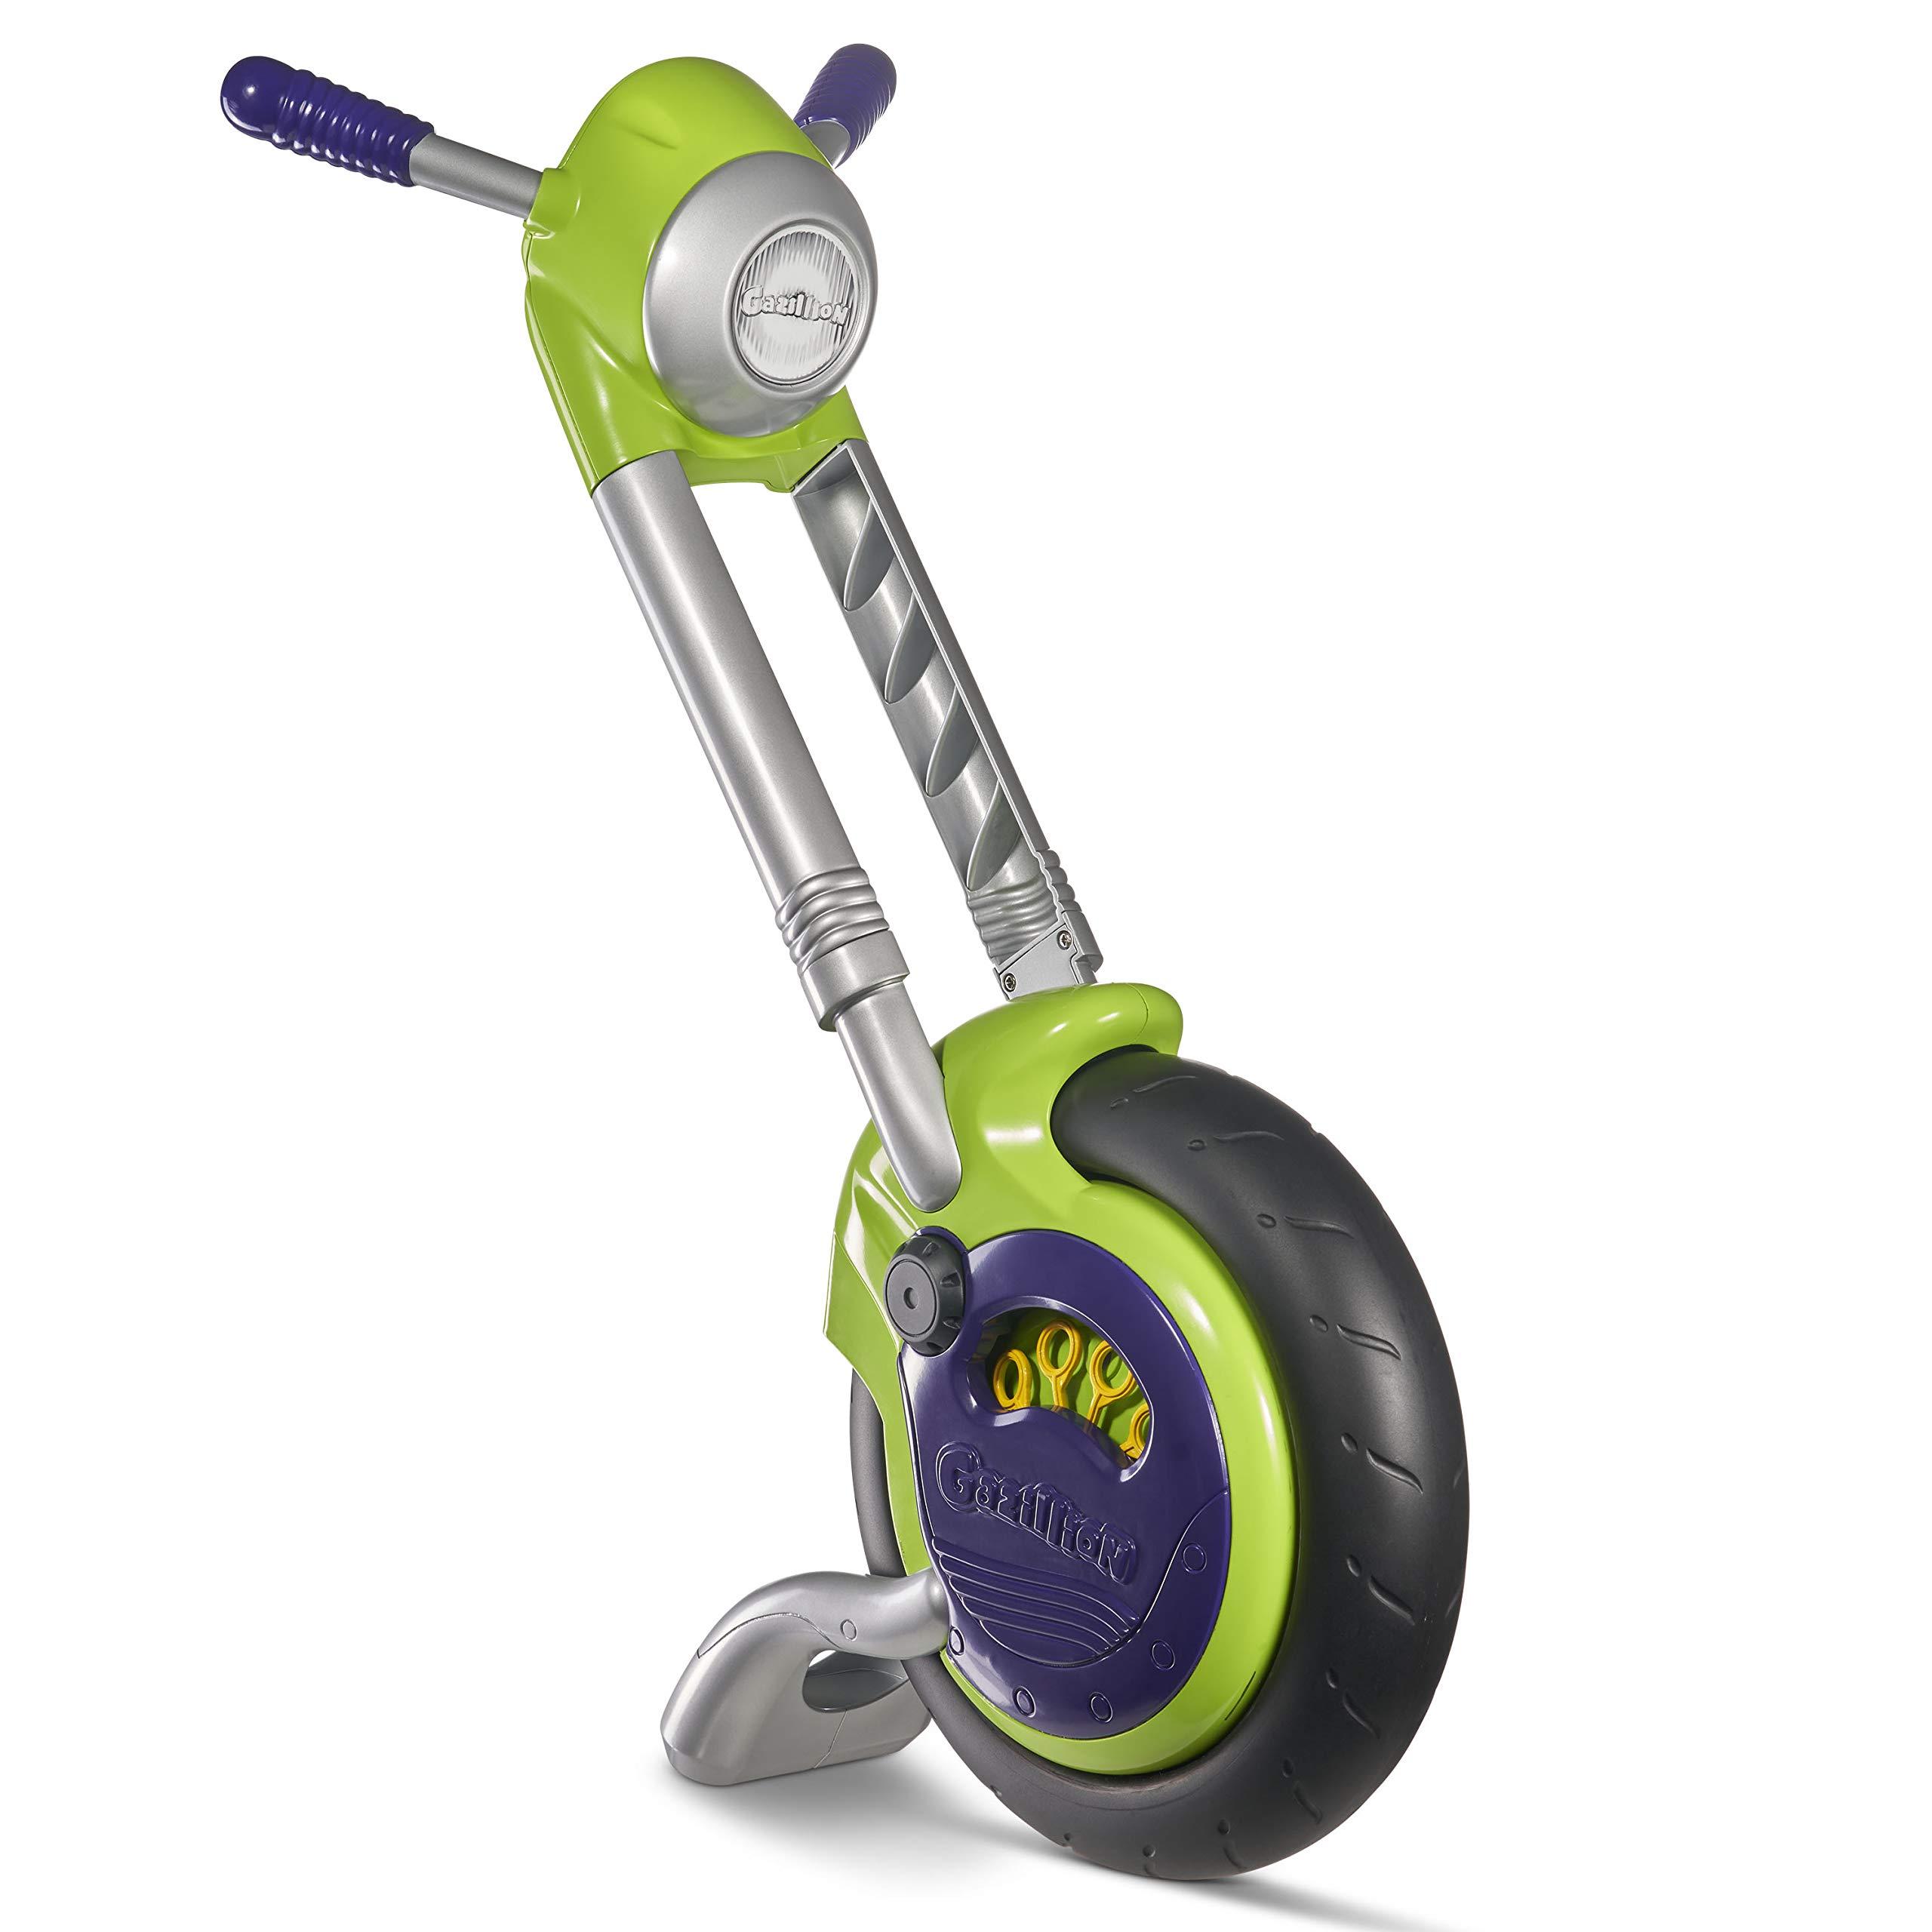 Gazillion Bubble Cycle Bubble Toy